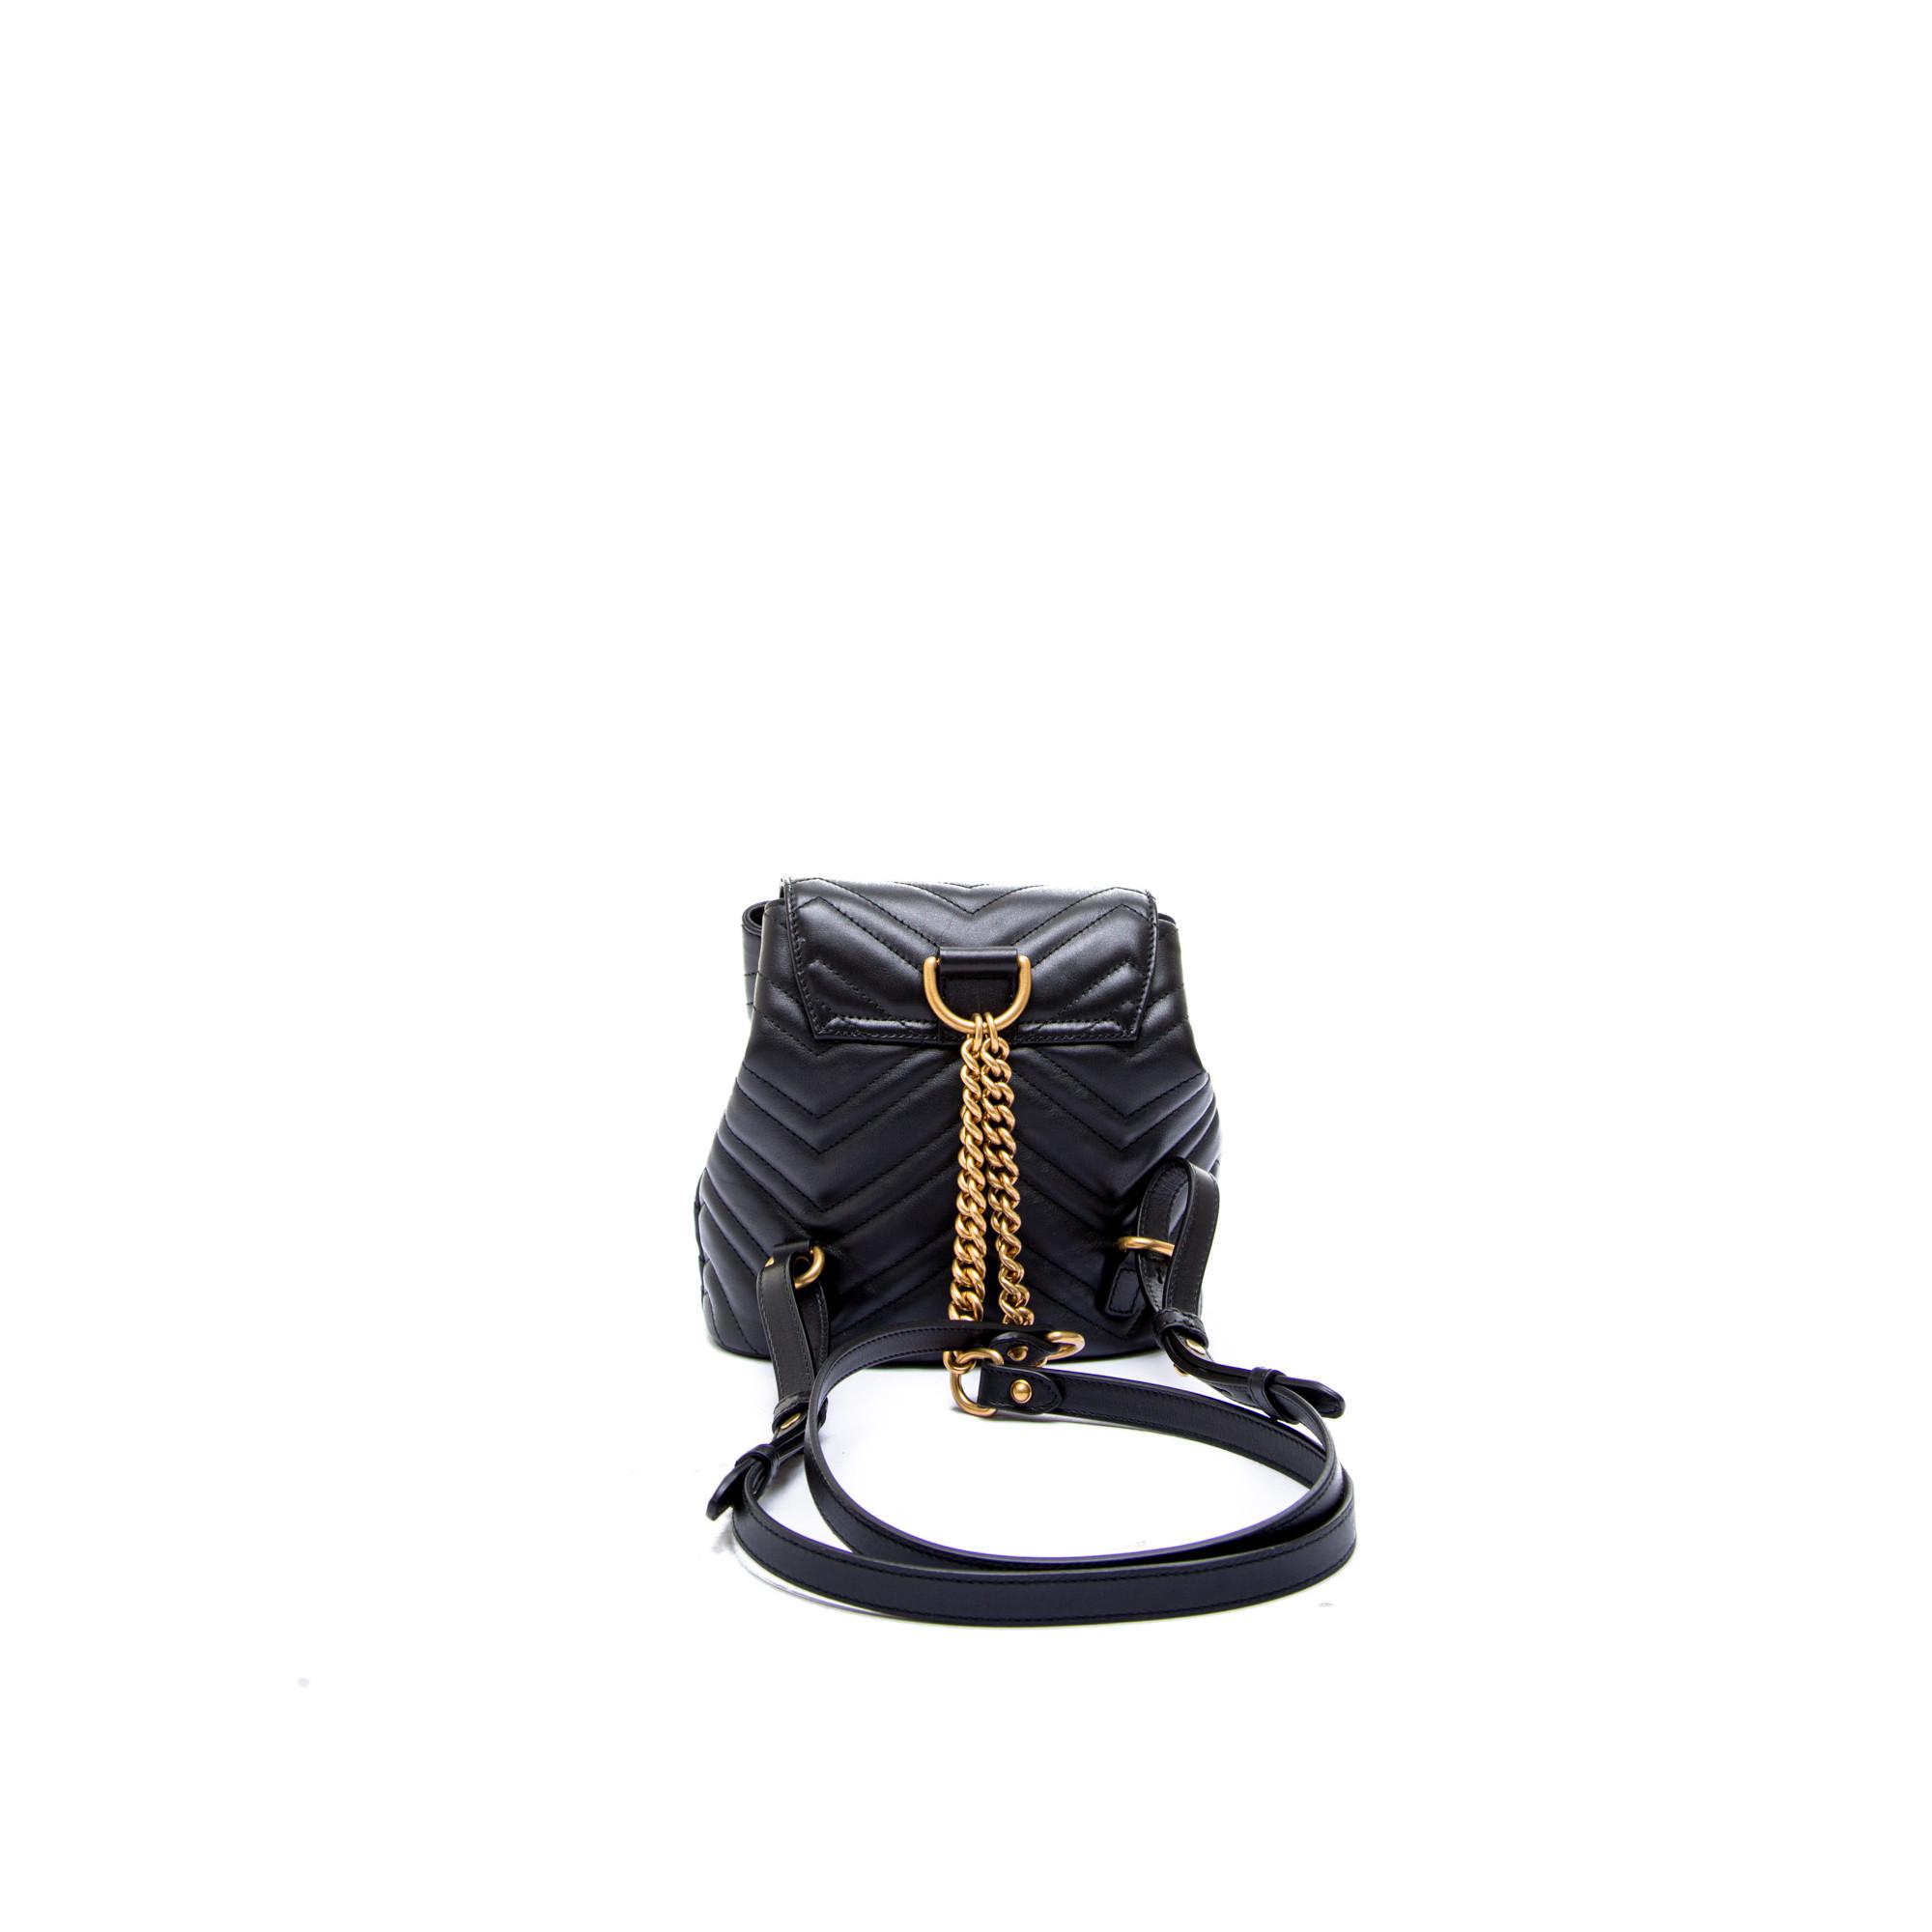 e2d517485c4 ... Gucci backpack gg marmont black Gucci backpack gg marmont black -  www.derodeloper.com ...